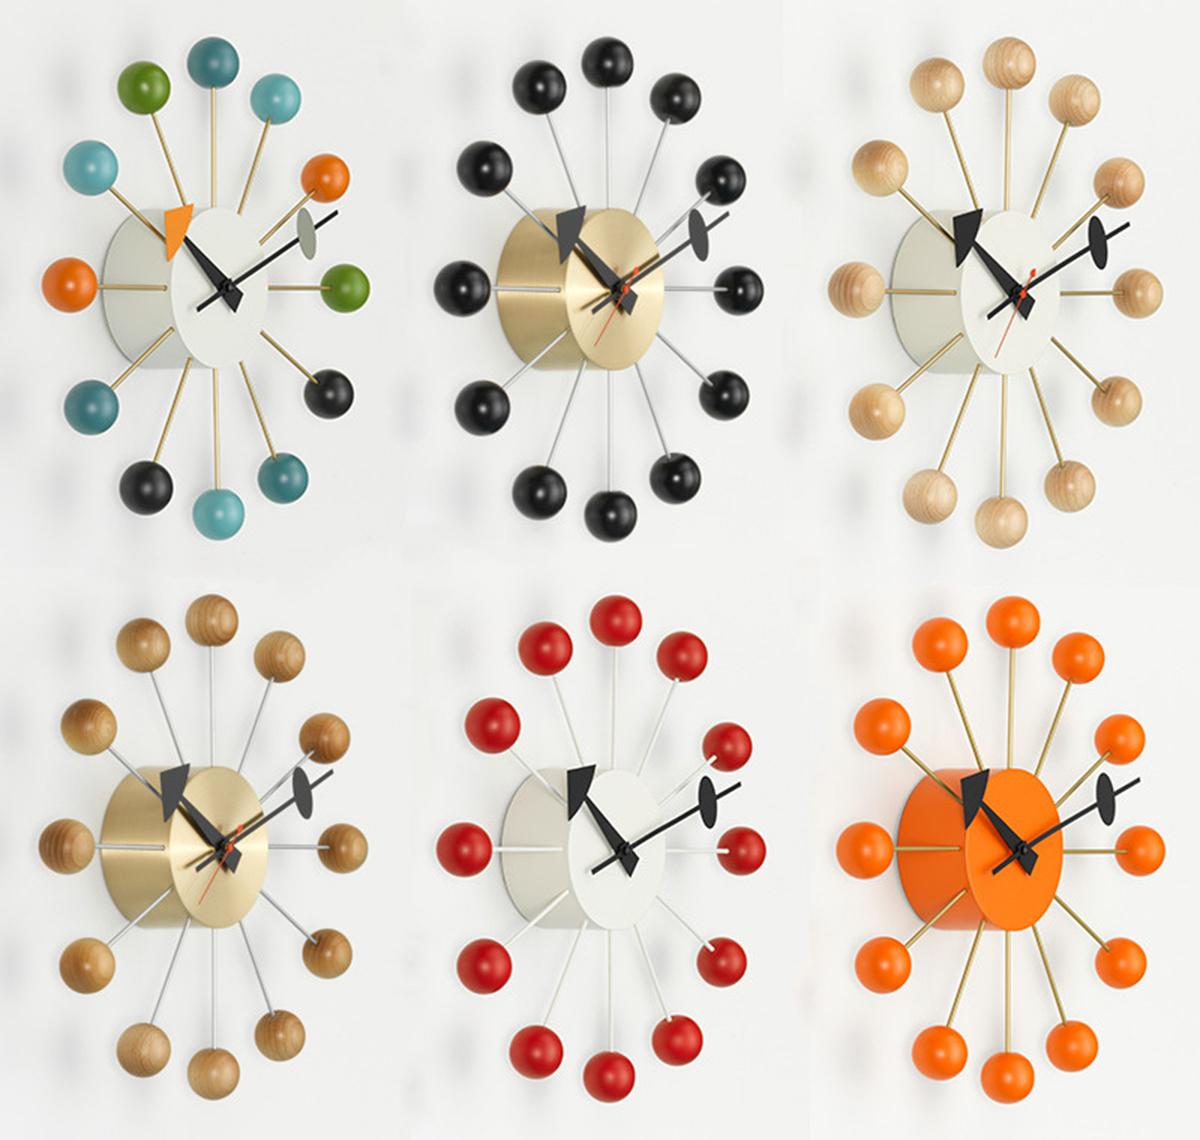 Vitra ball clock full collection